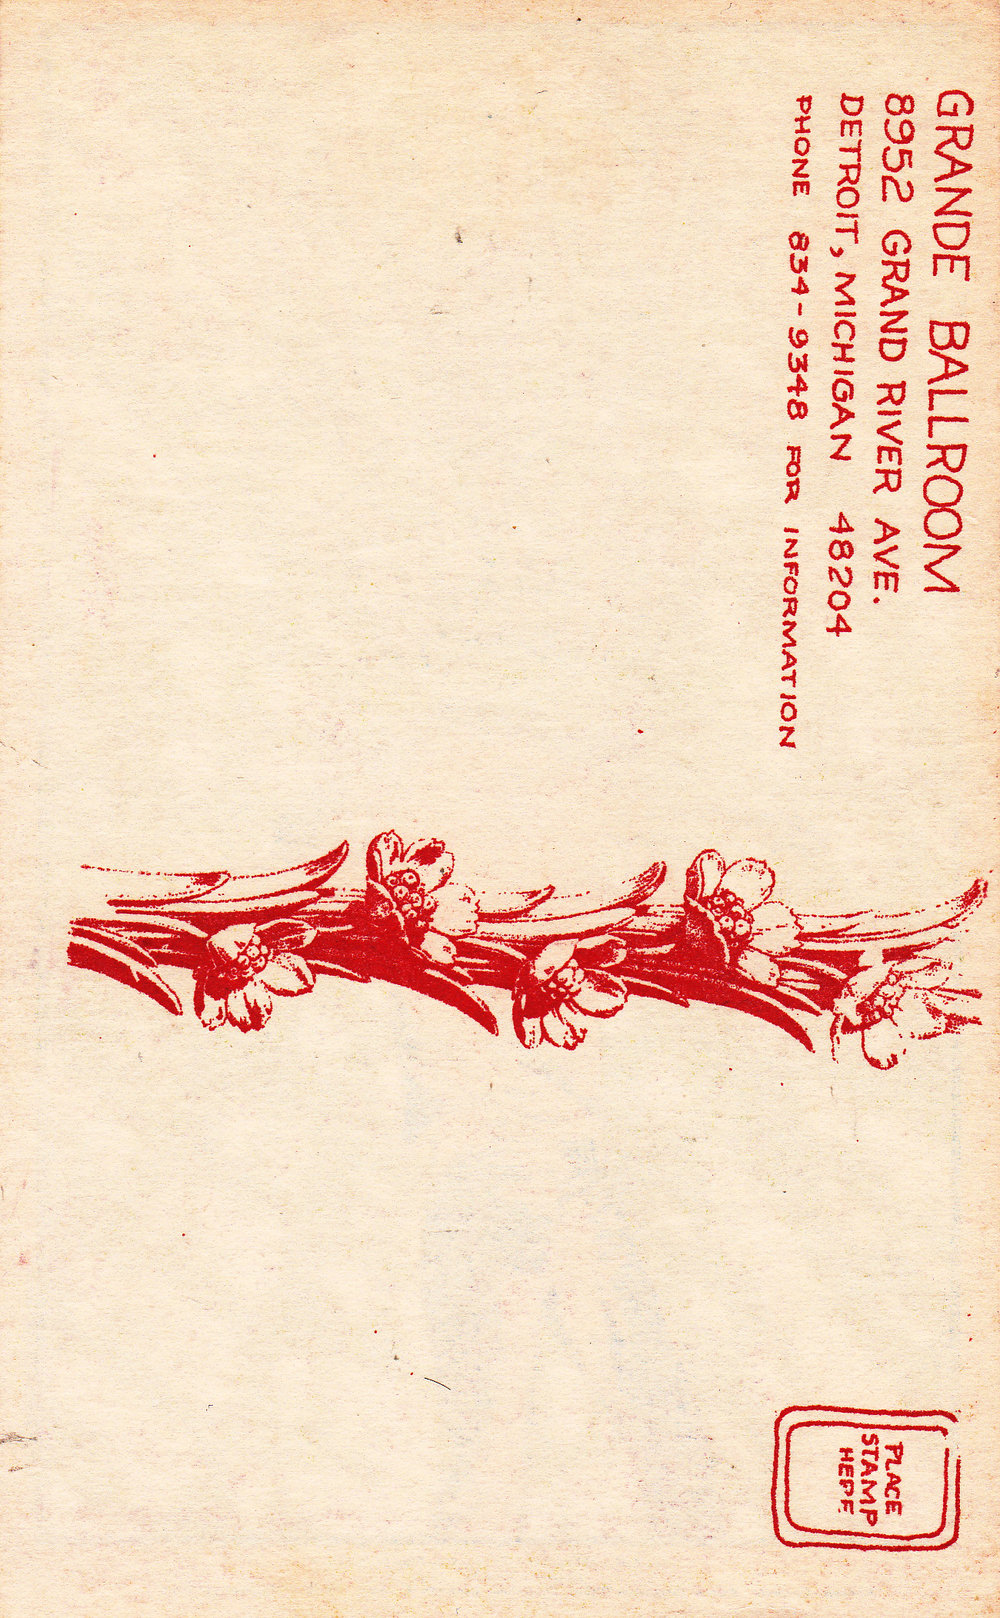 31_B_2_23_68Masonic Temple - Jimi Hendrix Eperience (Handbill) Back.jpg